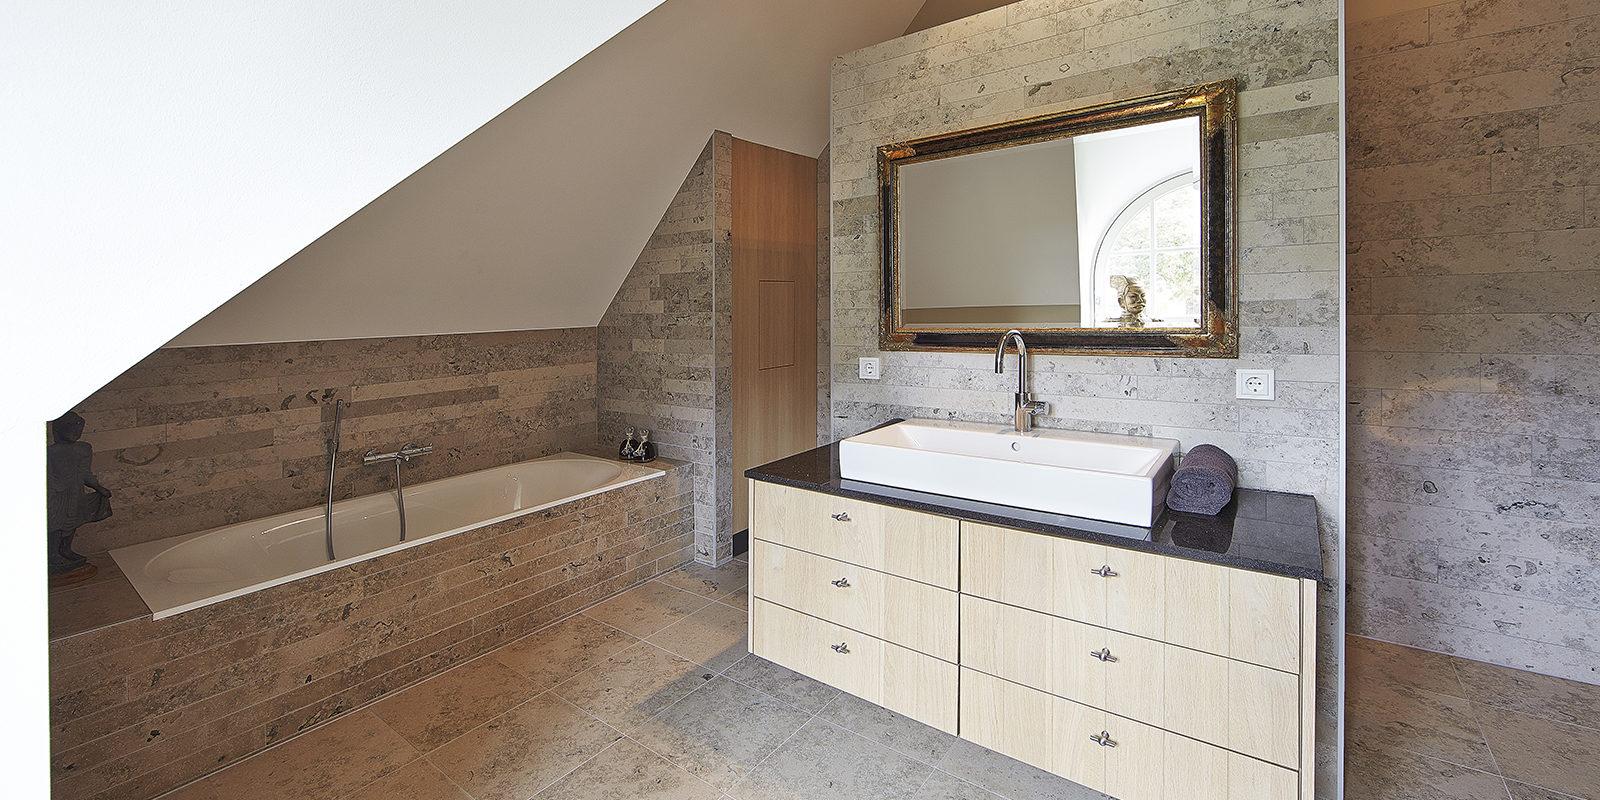 The Art of Living, Exclusief wonen, Marco Daverveld Interieur designer, badkamer, spiegel, bad, design, sanitair, tegelvloer, modern